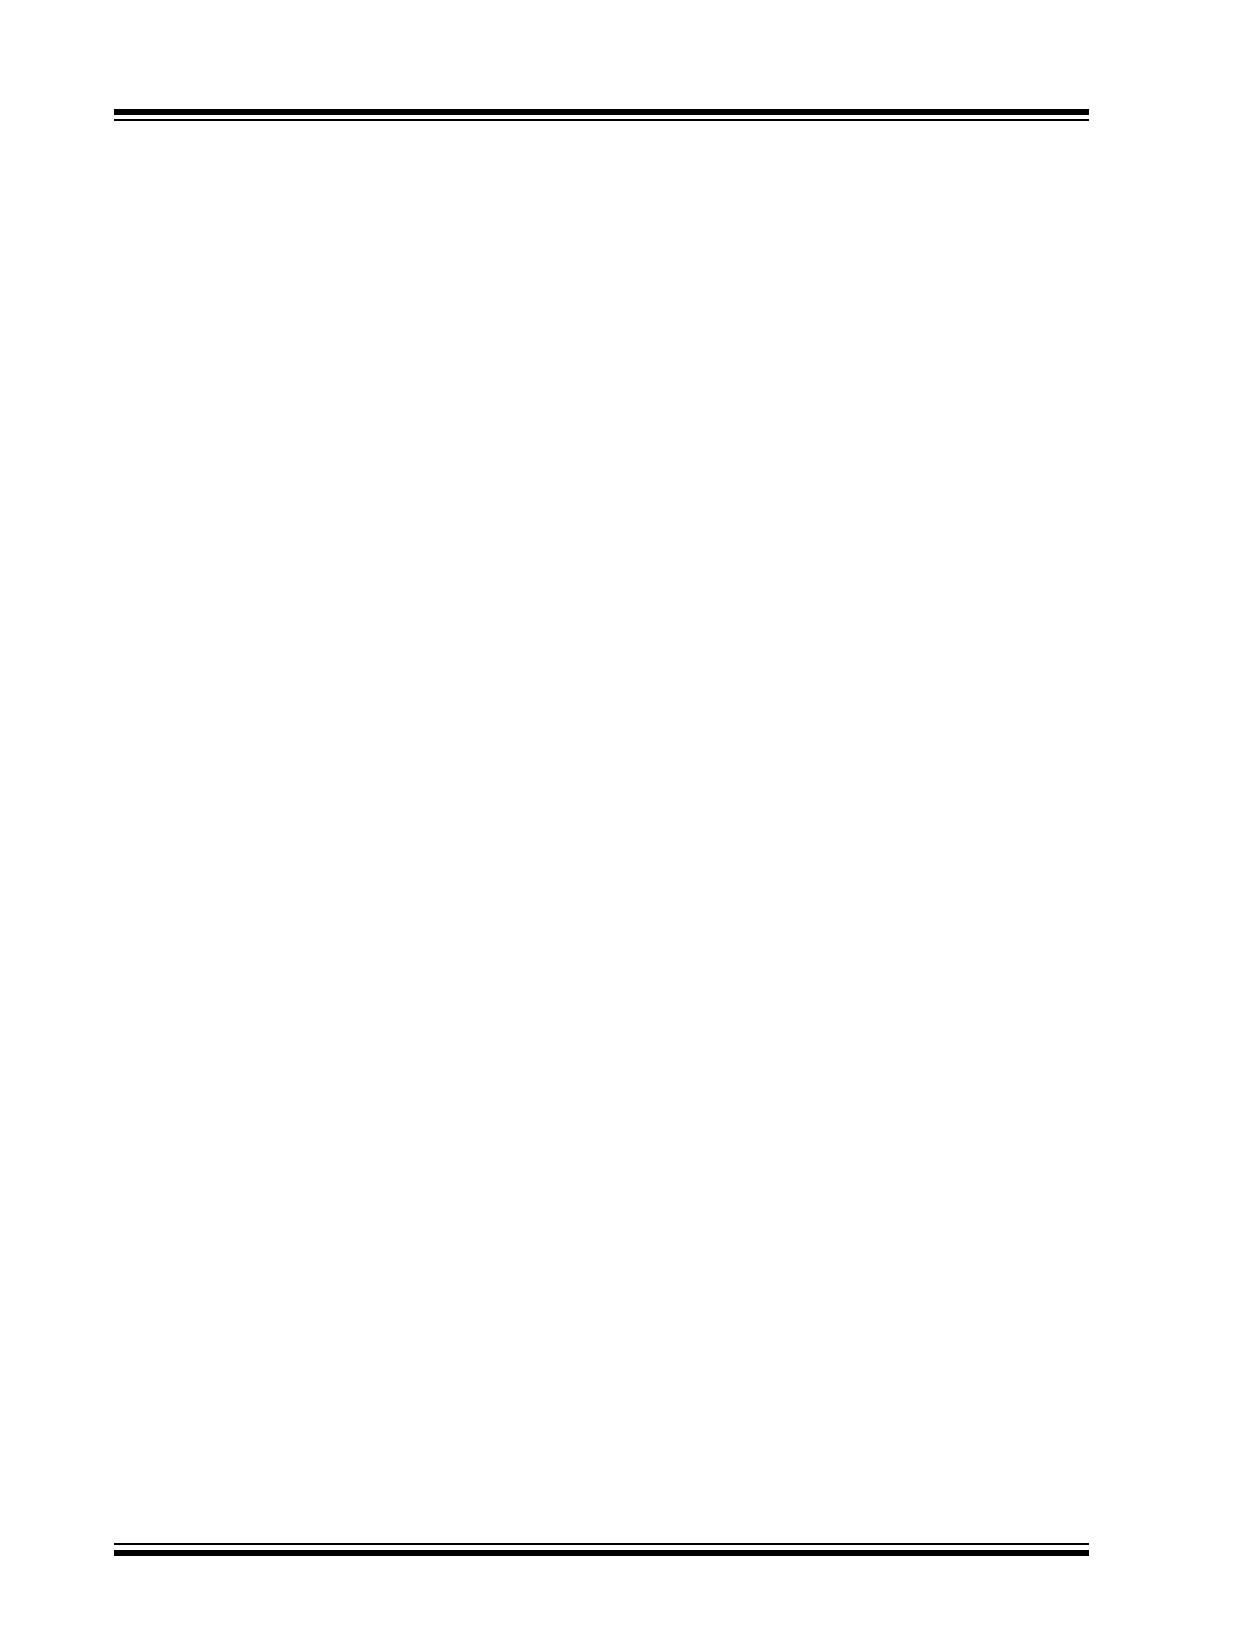 IS1870 pdf, 전자부품, 반도체, 판매, 대치품